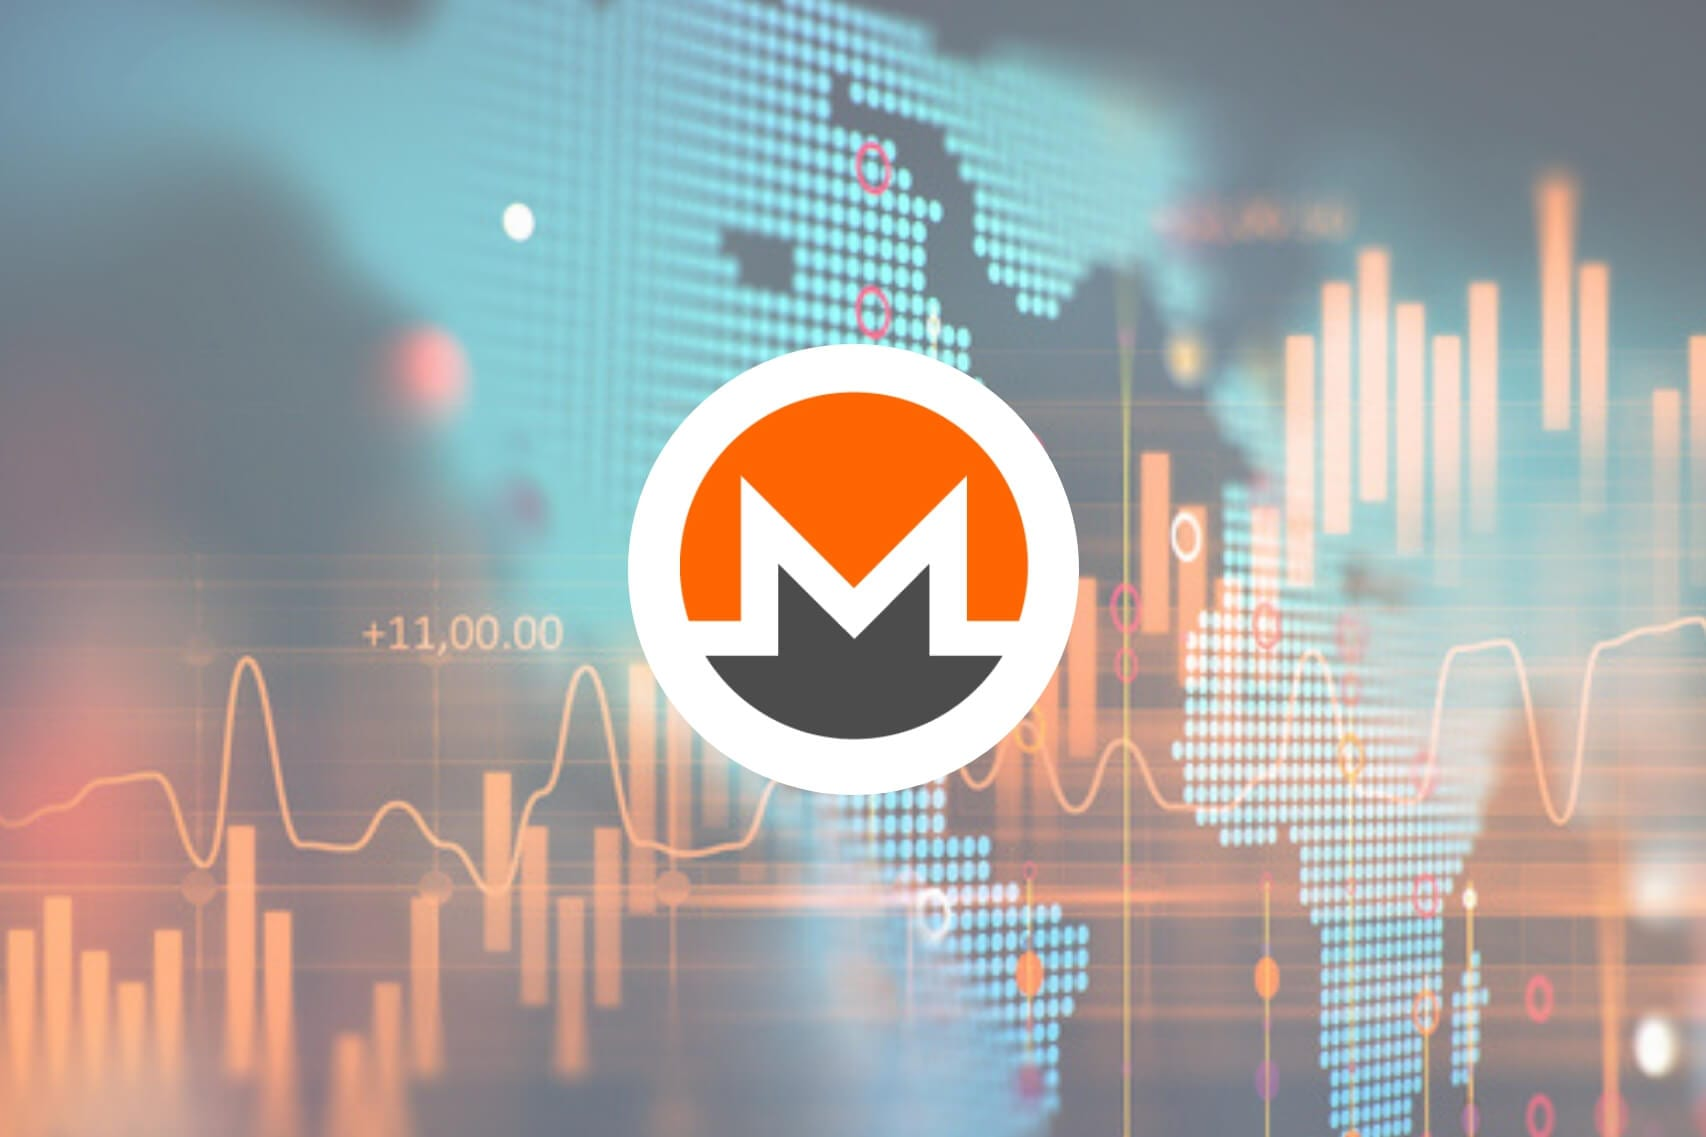 xmr price jan - Monero Price Prediction: $100 Is A Vital Level For XMR Bulls